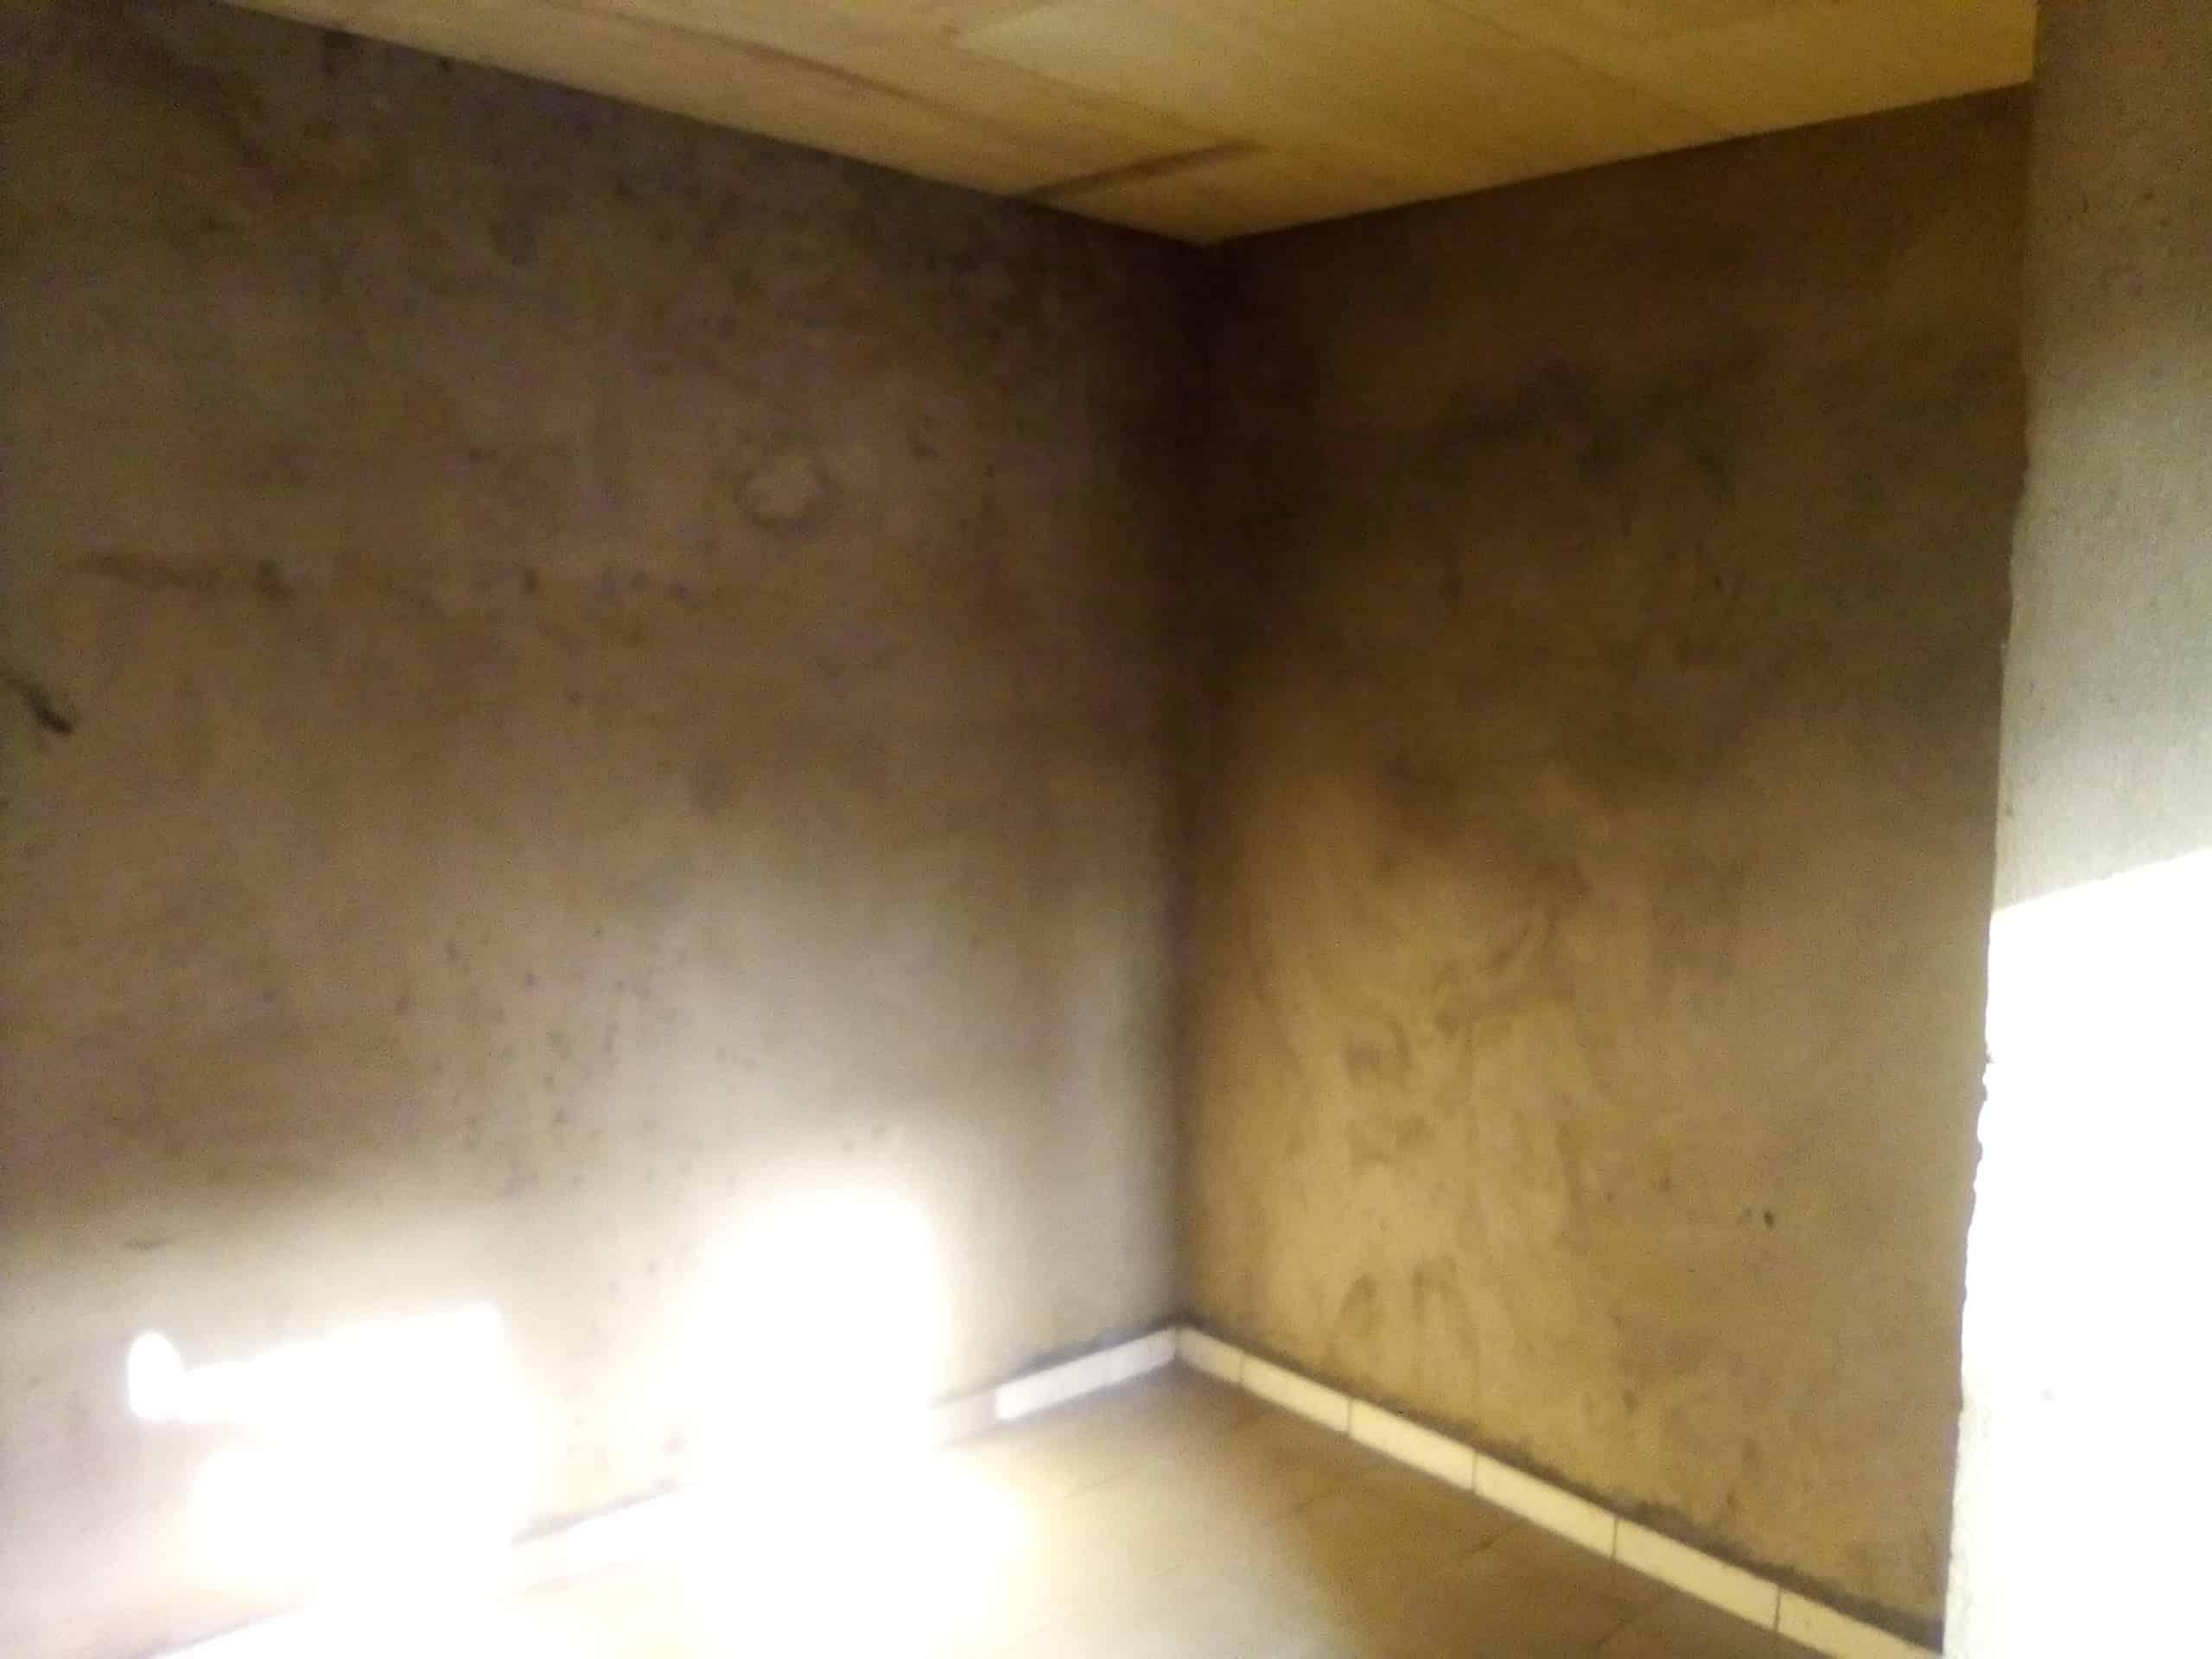 Studio to rent - Douala, Makepe, BM - 25 000 FCFA / month